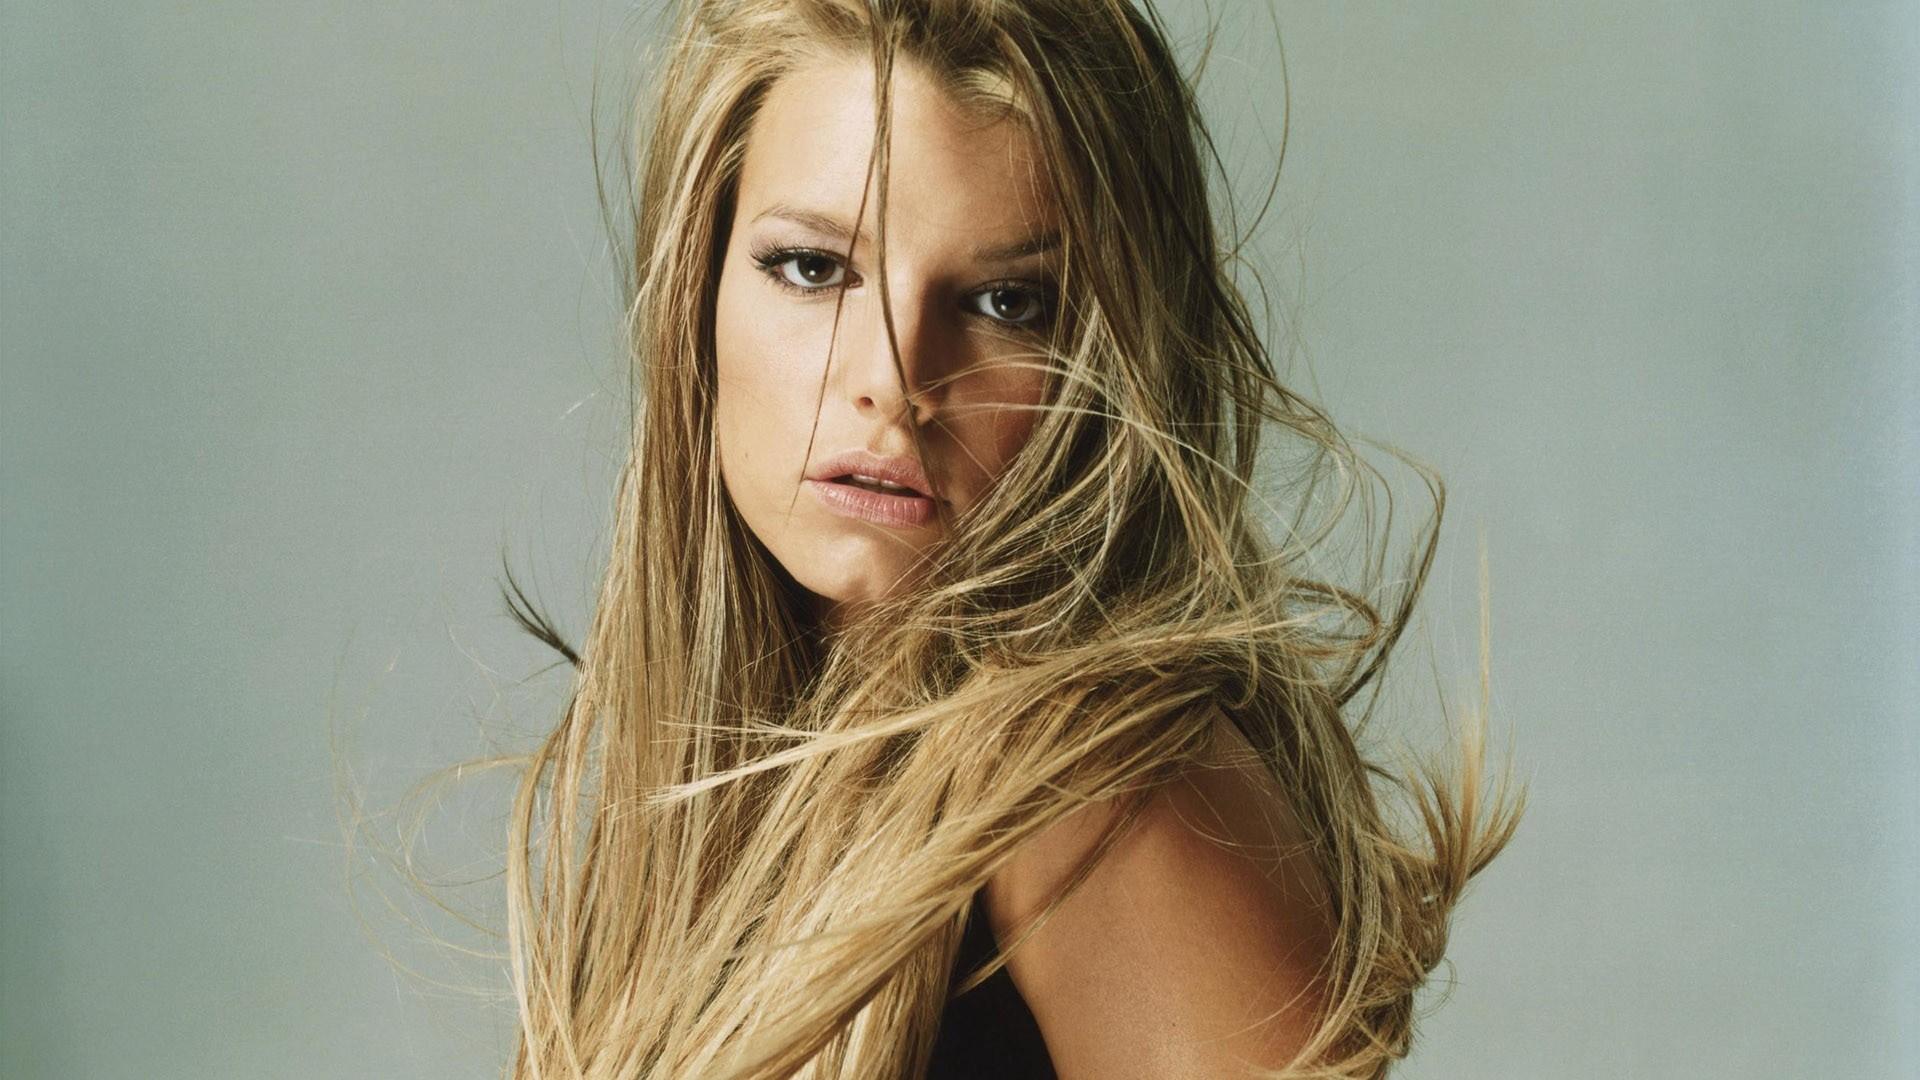 Wallpaper Jessica simpson, Blonde, Hair, Shoulder, Look HD, Picture, Image